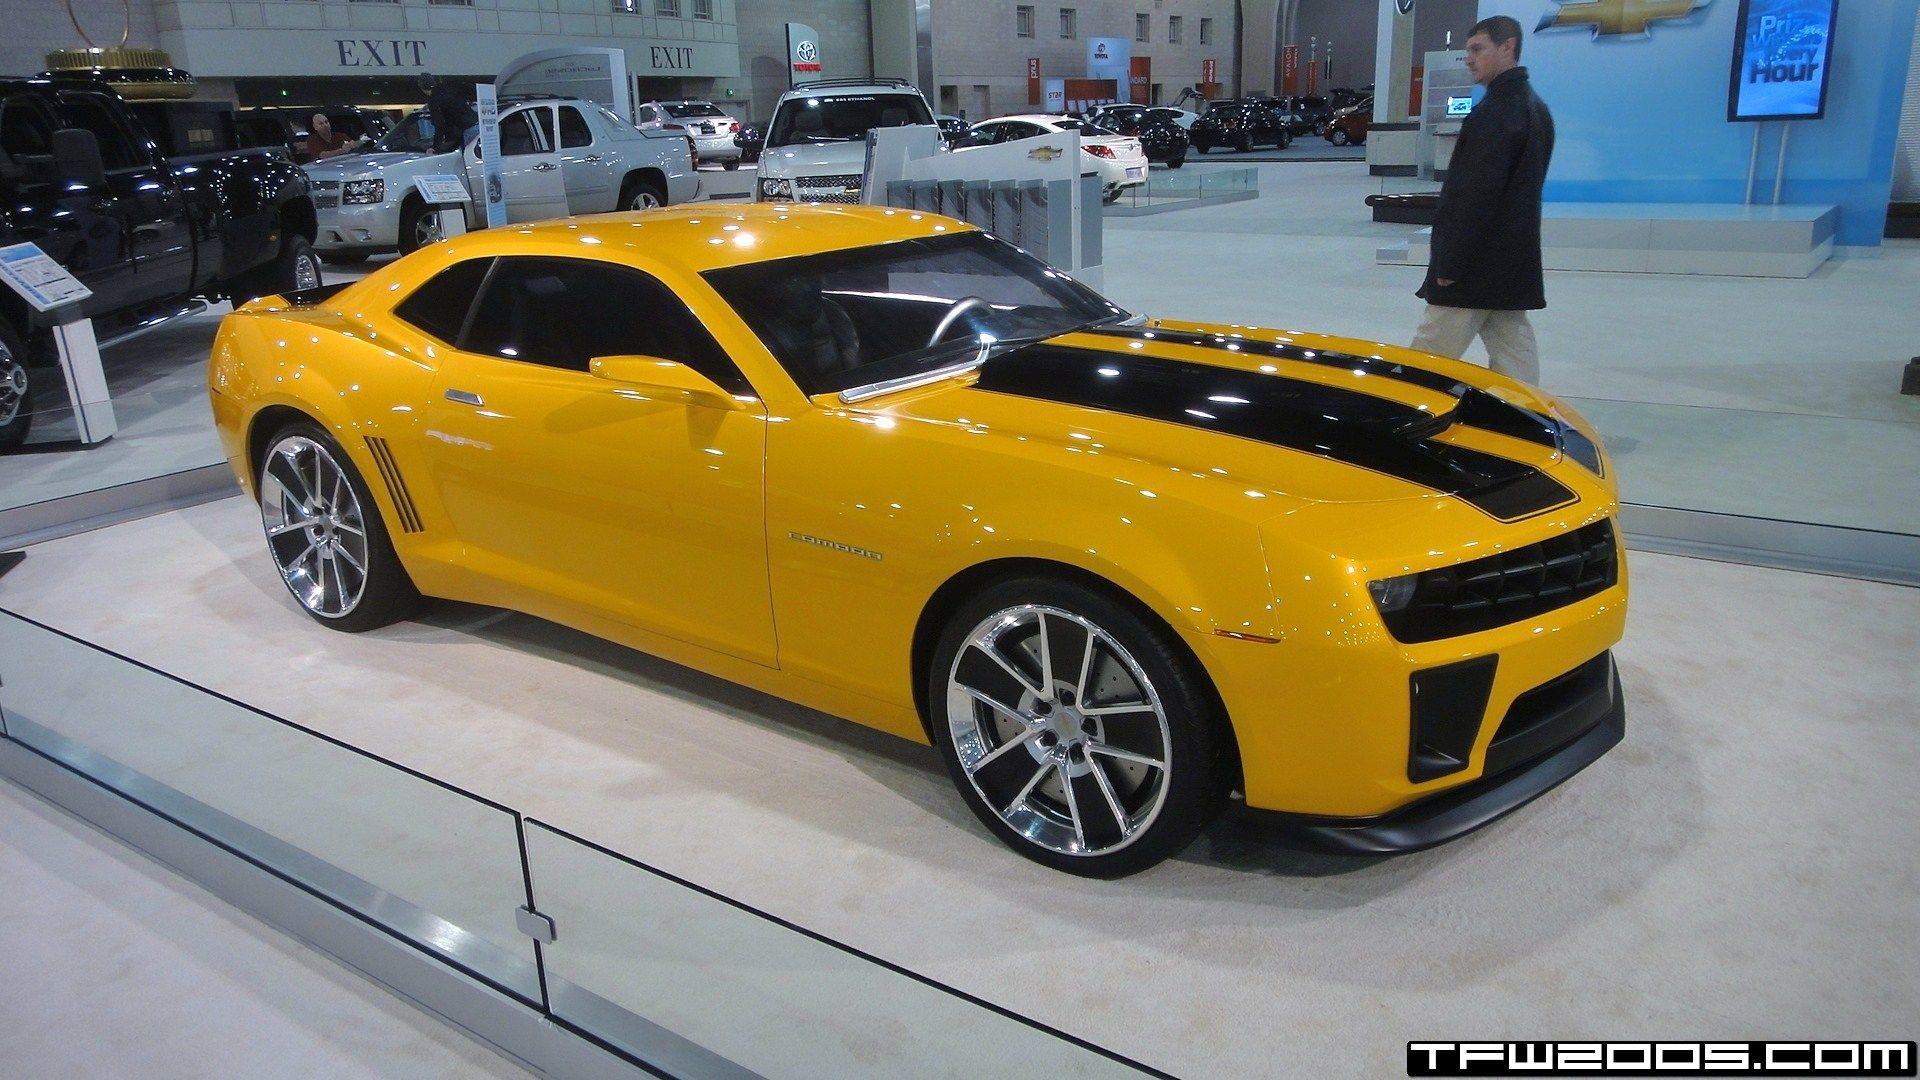 Transformers movie bumblebee camaro up close transformer - Transformers bumblebee car wallpaper ...